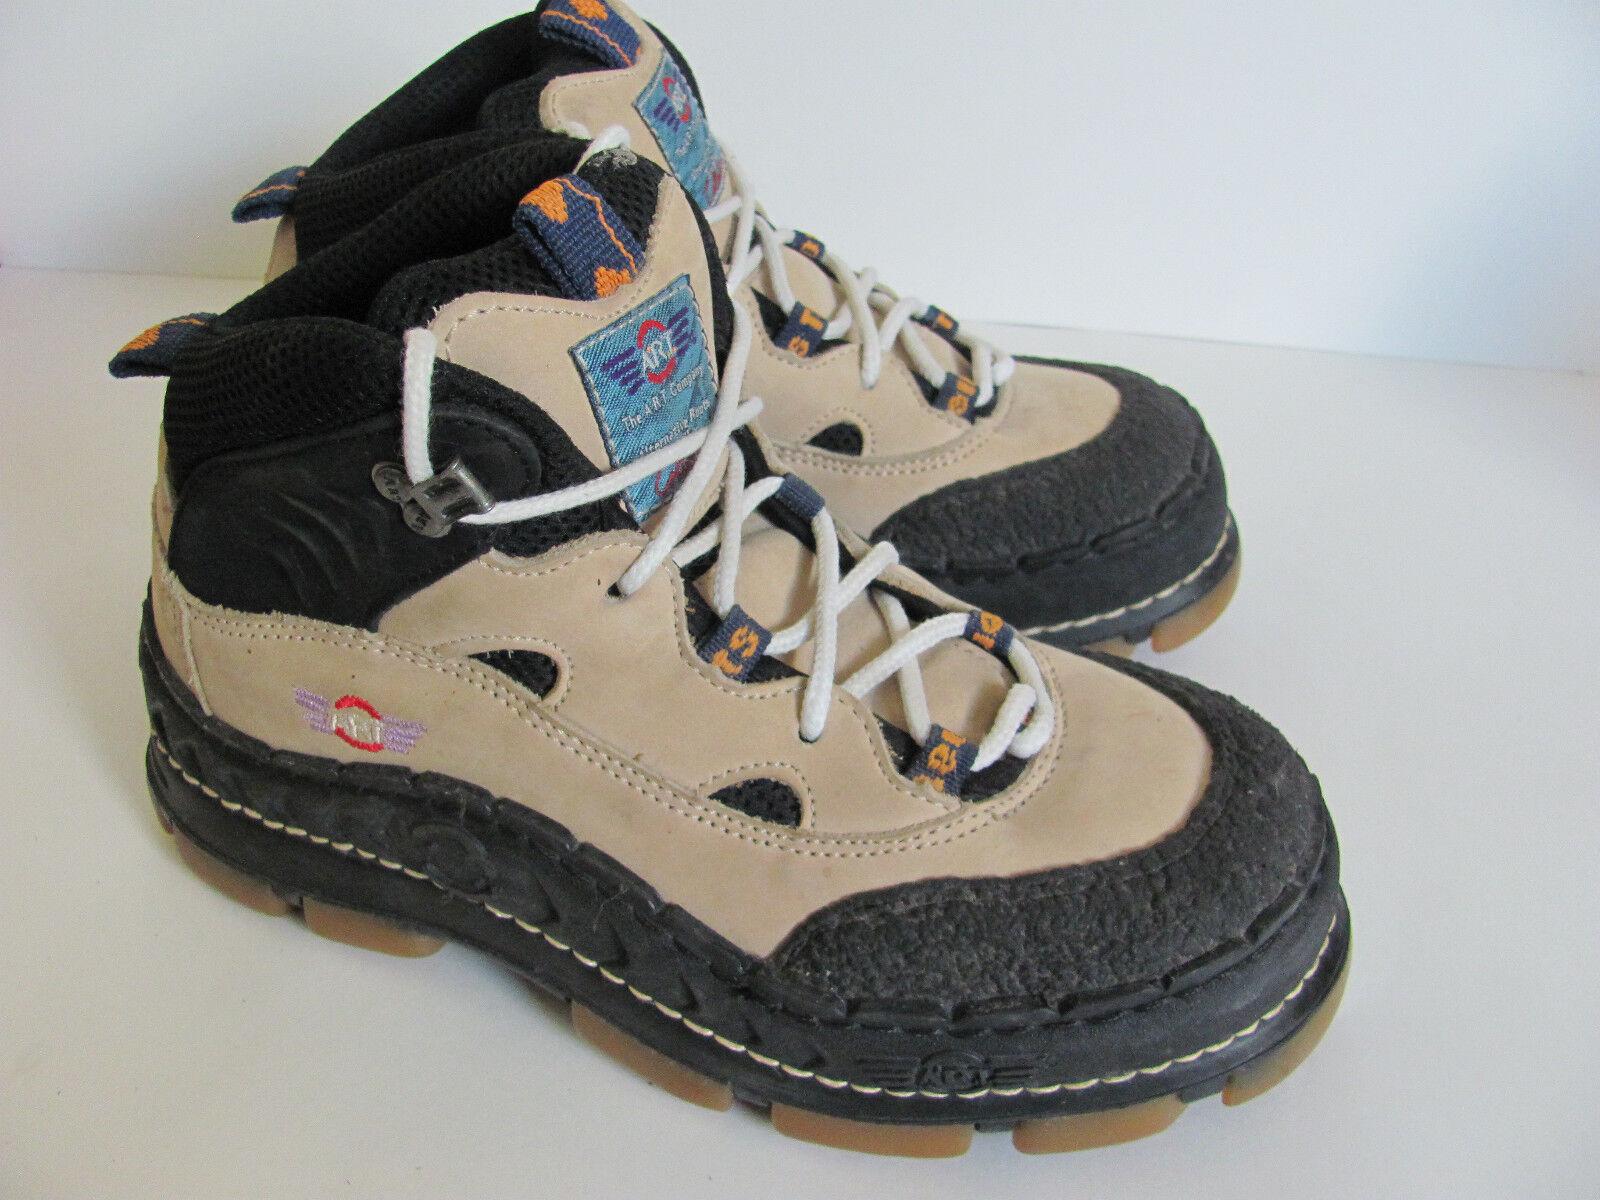 The ART D.A.S.  Lace Up Hiking Trail Boots,  Men's 7, Euro 40 Spain  Marten